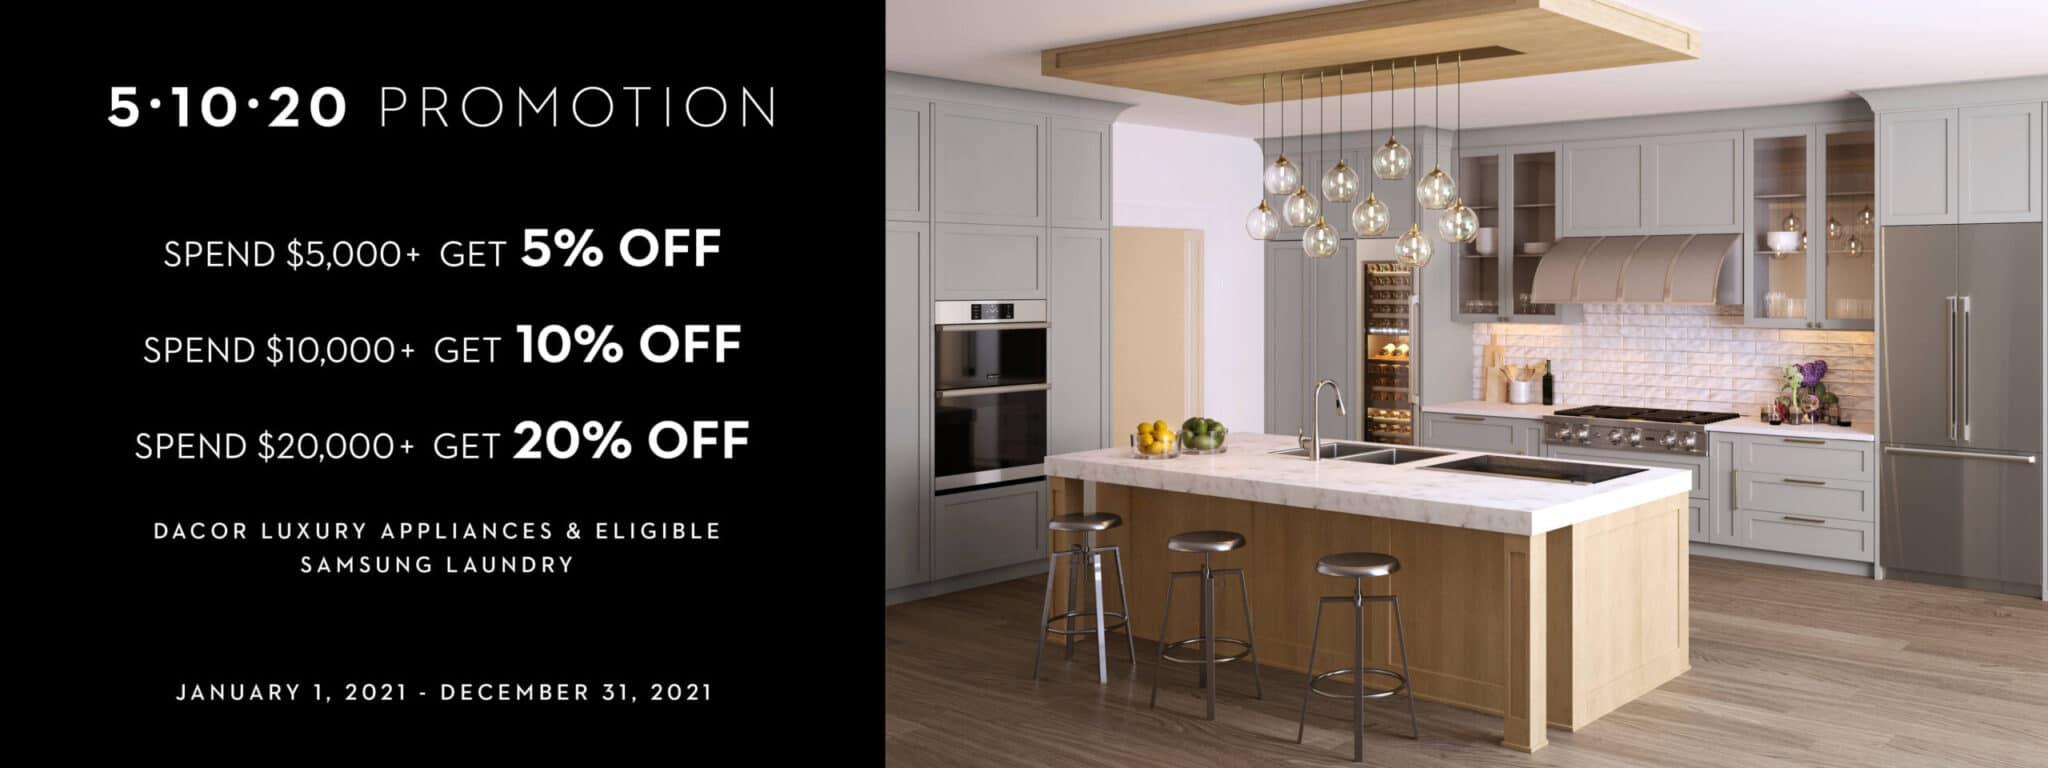 Dacor Appliance Promotion